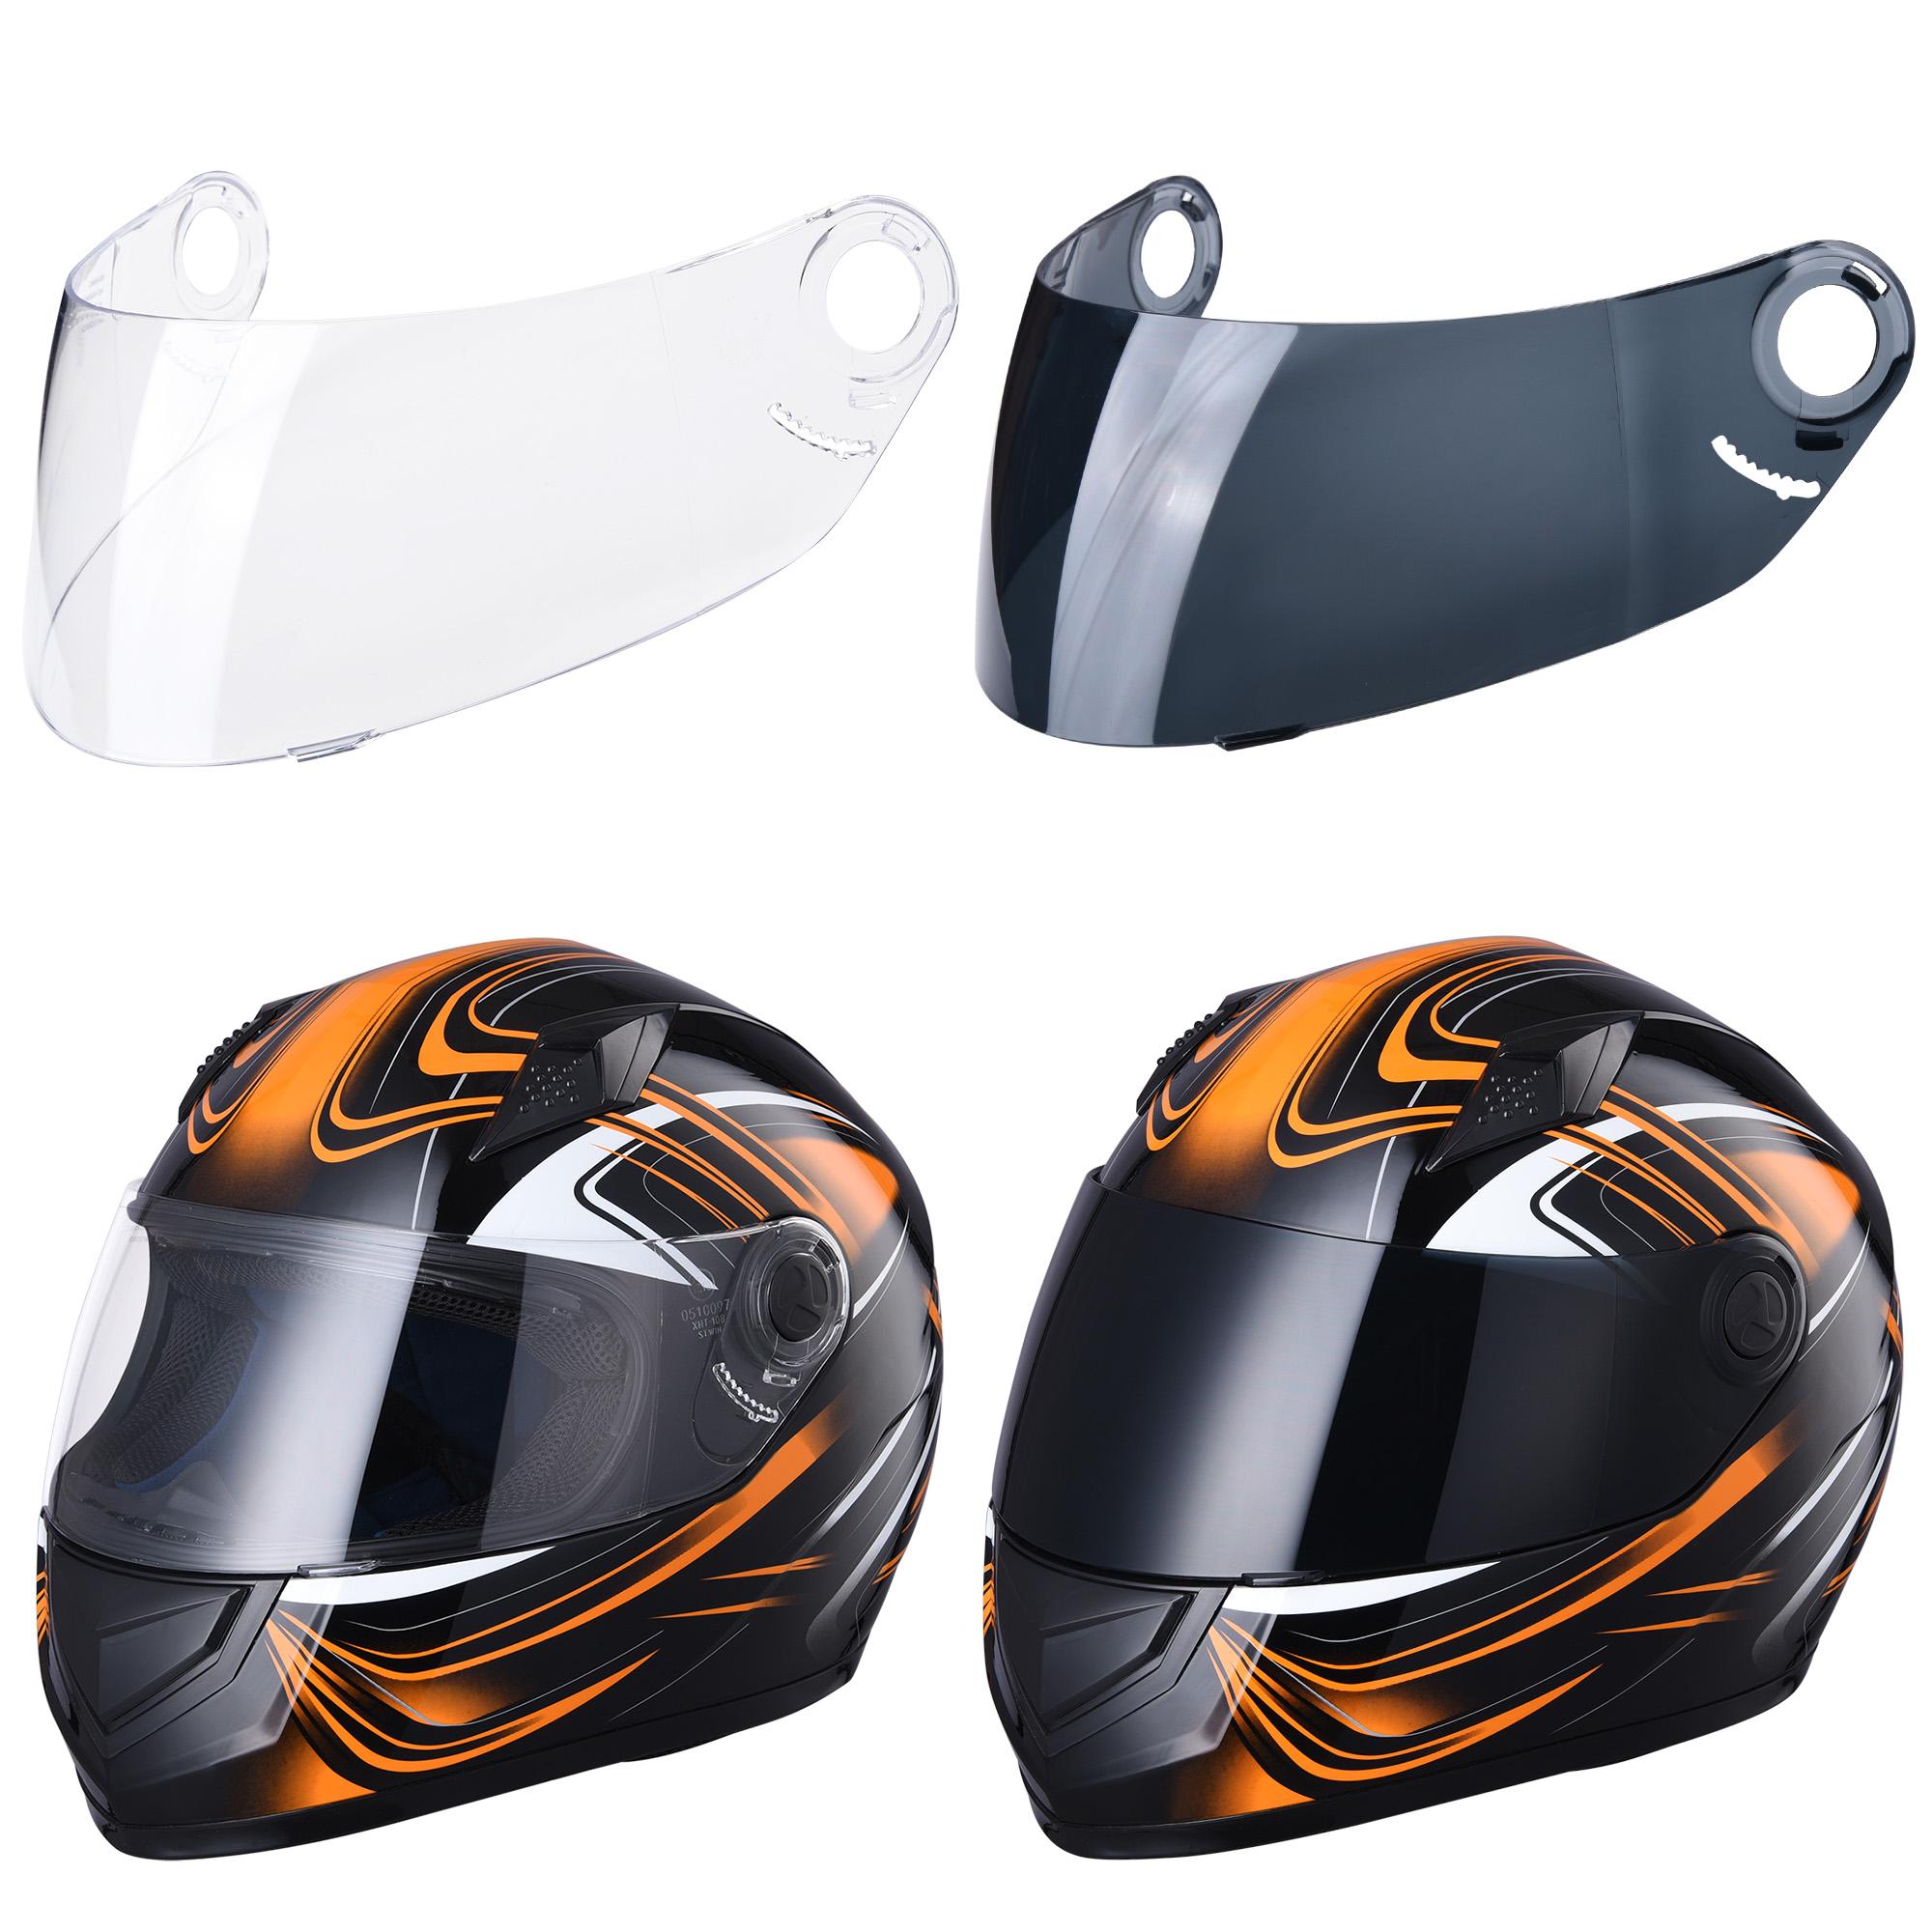 miniature 115 - AHR K12 Full Face Motorcycle Helmet DOT Air Vents Clear Visor Racing S M L XL